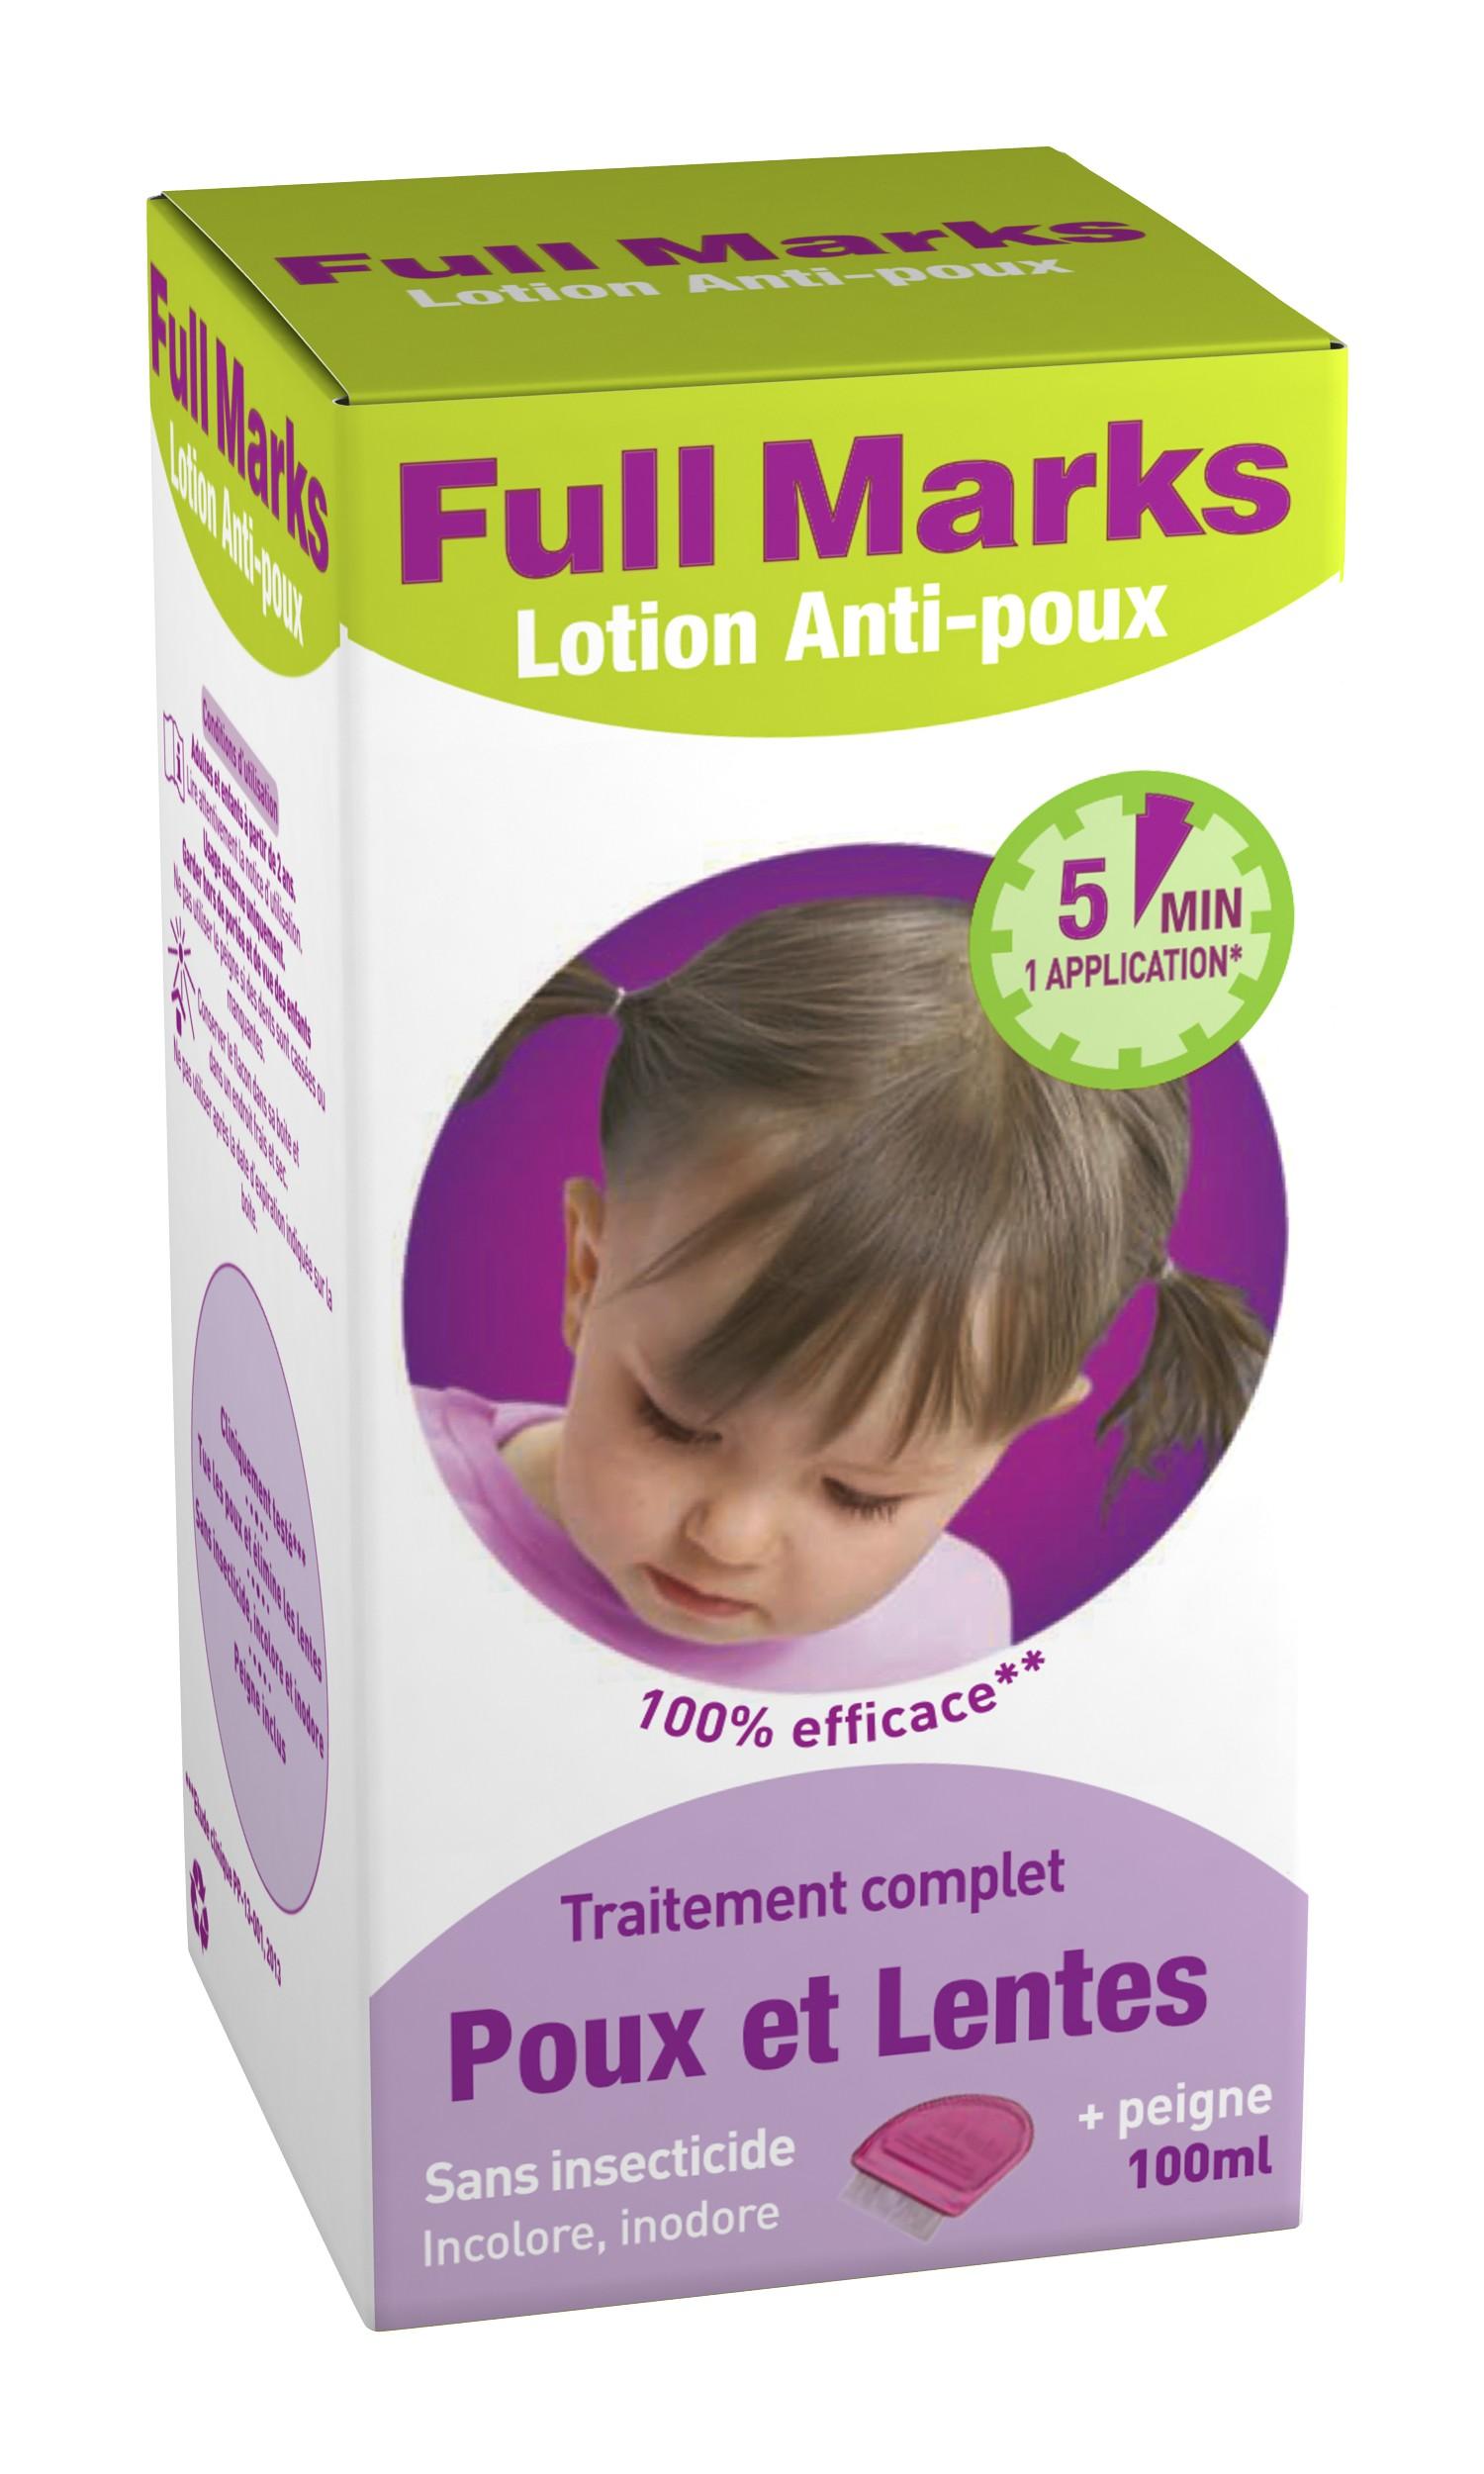 Full Marks Lotion Anti poux